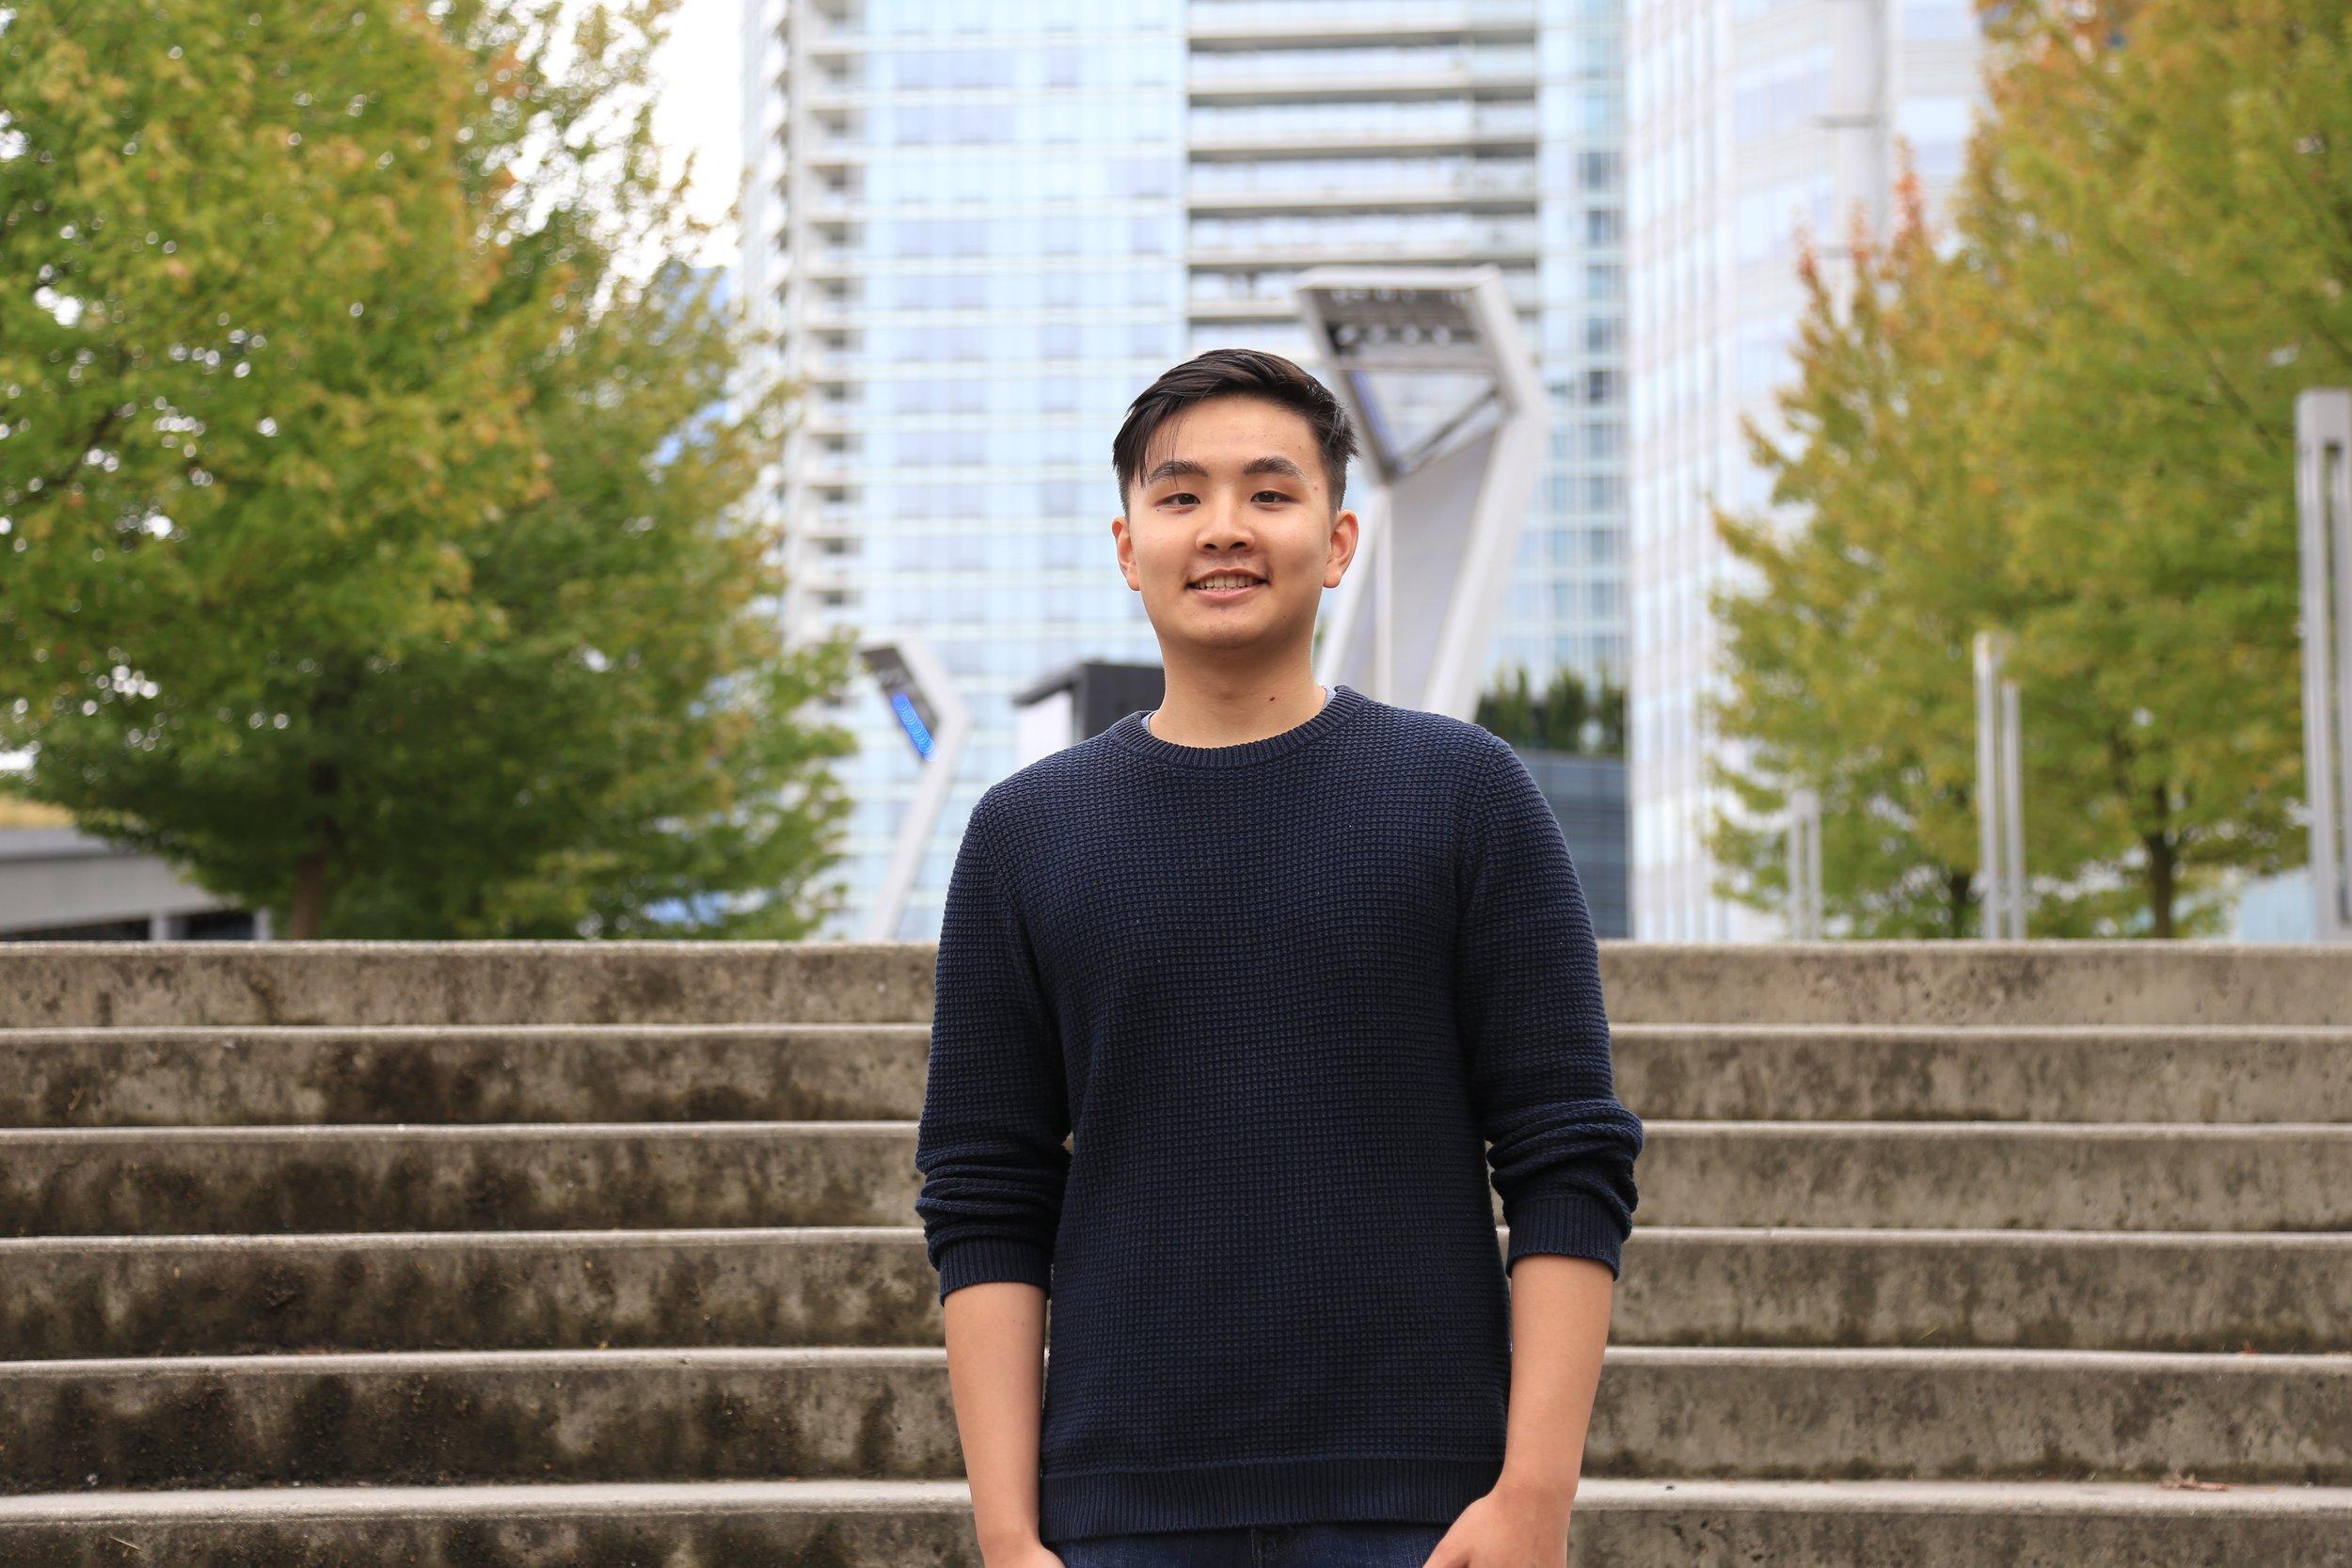 Chief Financial Officer - Steven Chen